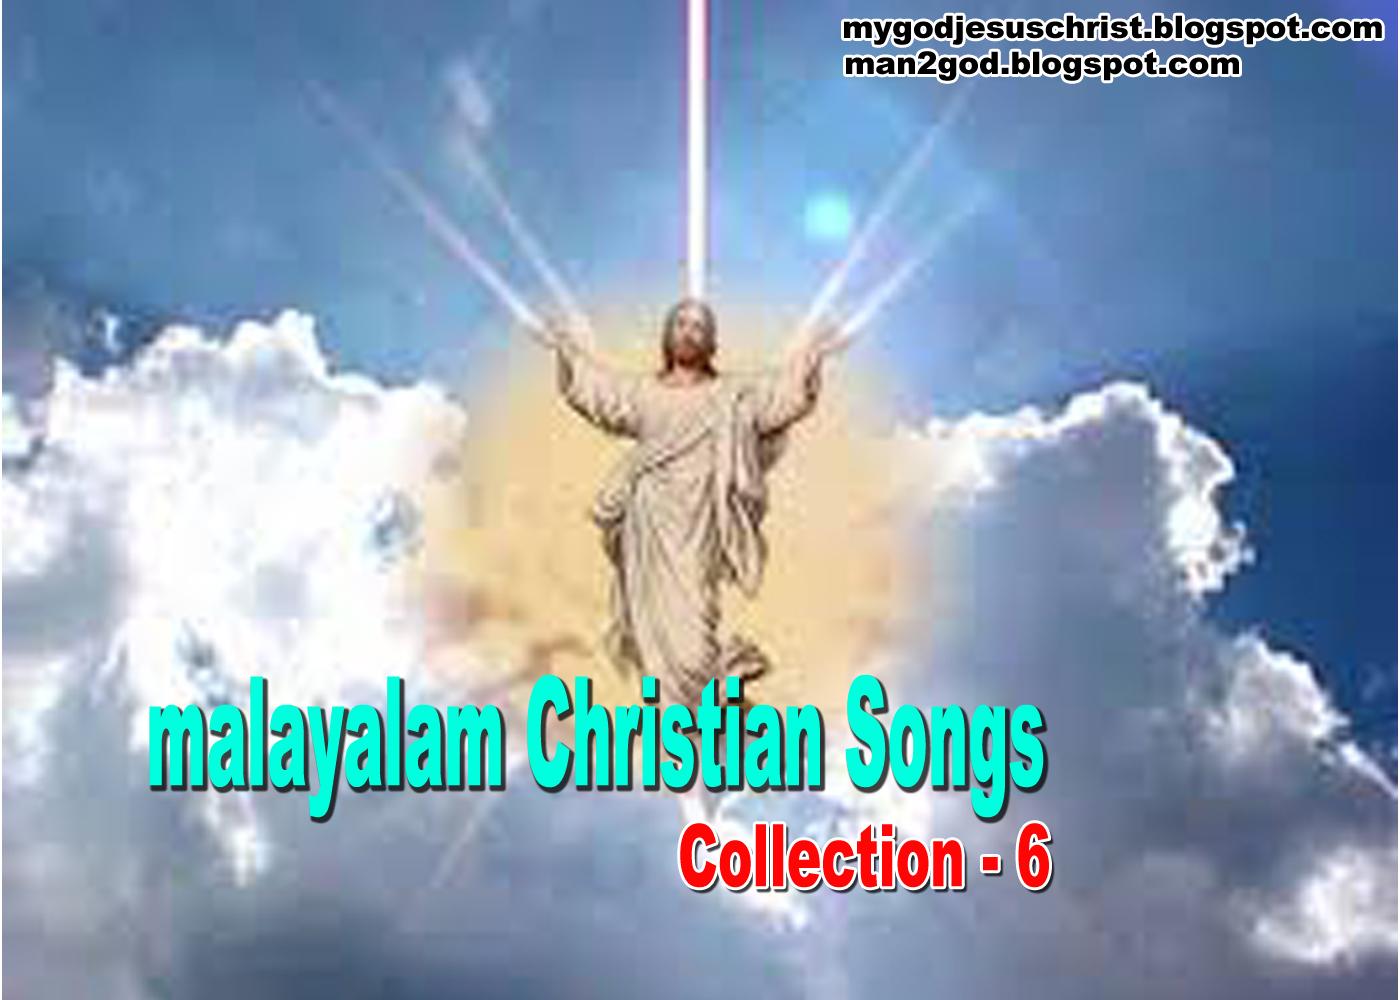 50 Top Christian Songs Free Download - wondershare.com